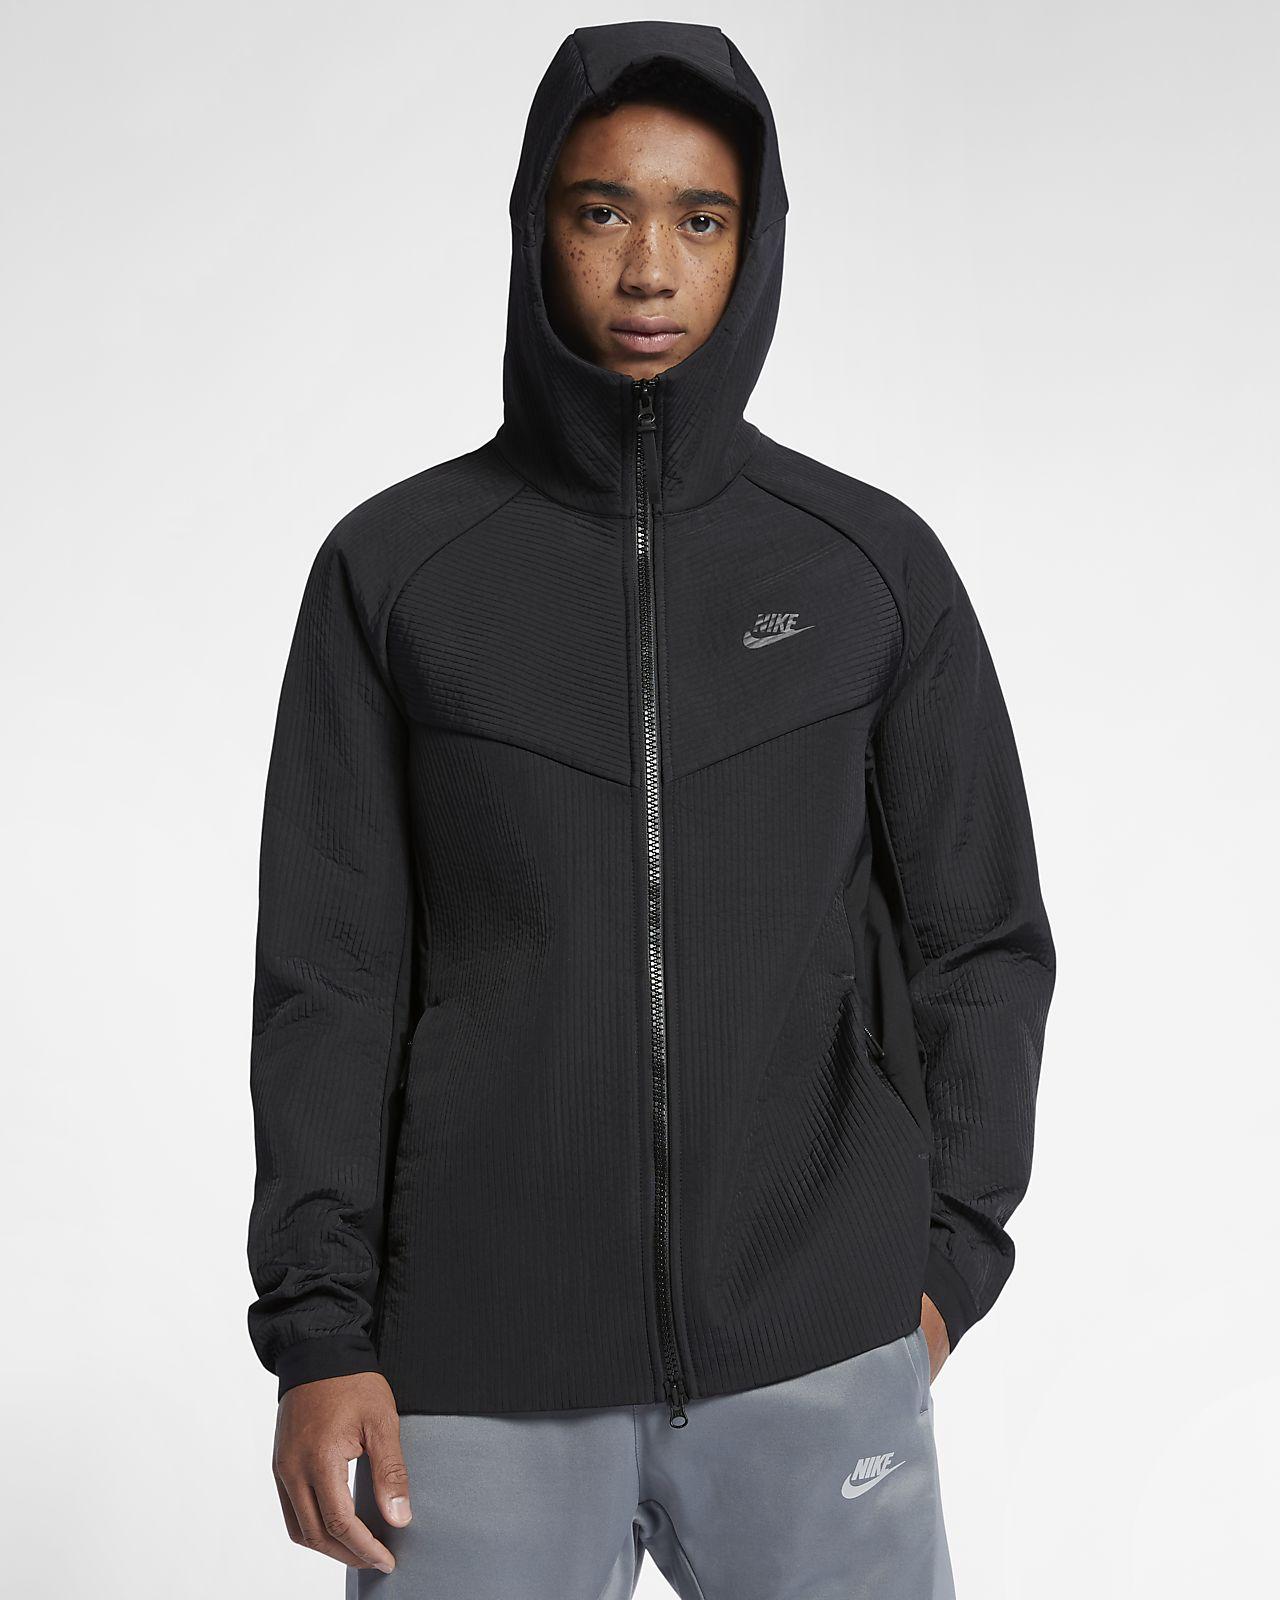 reputable site 6bd6b 95159 Nike Sportswear Tech Pack